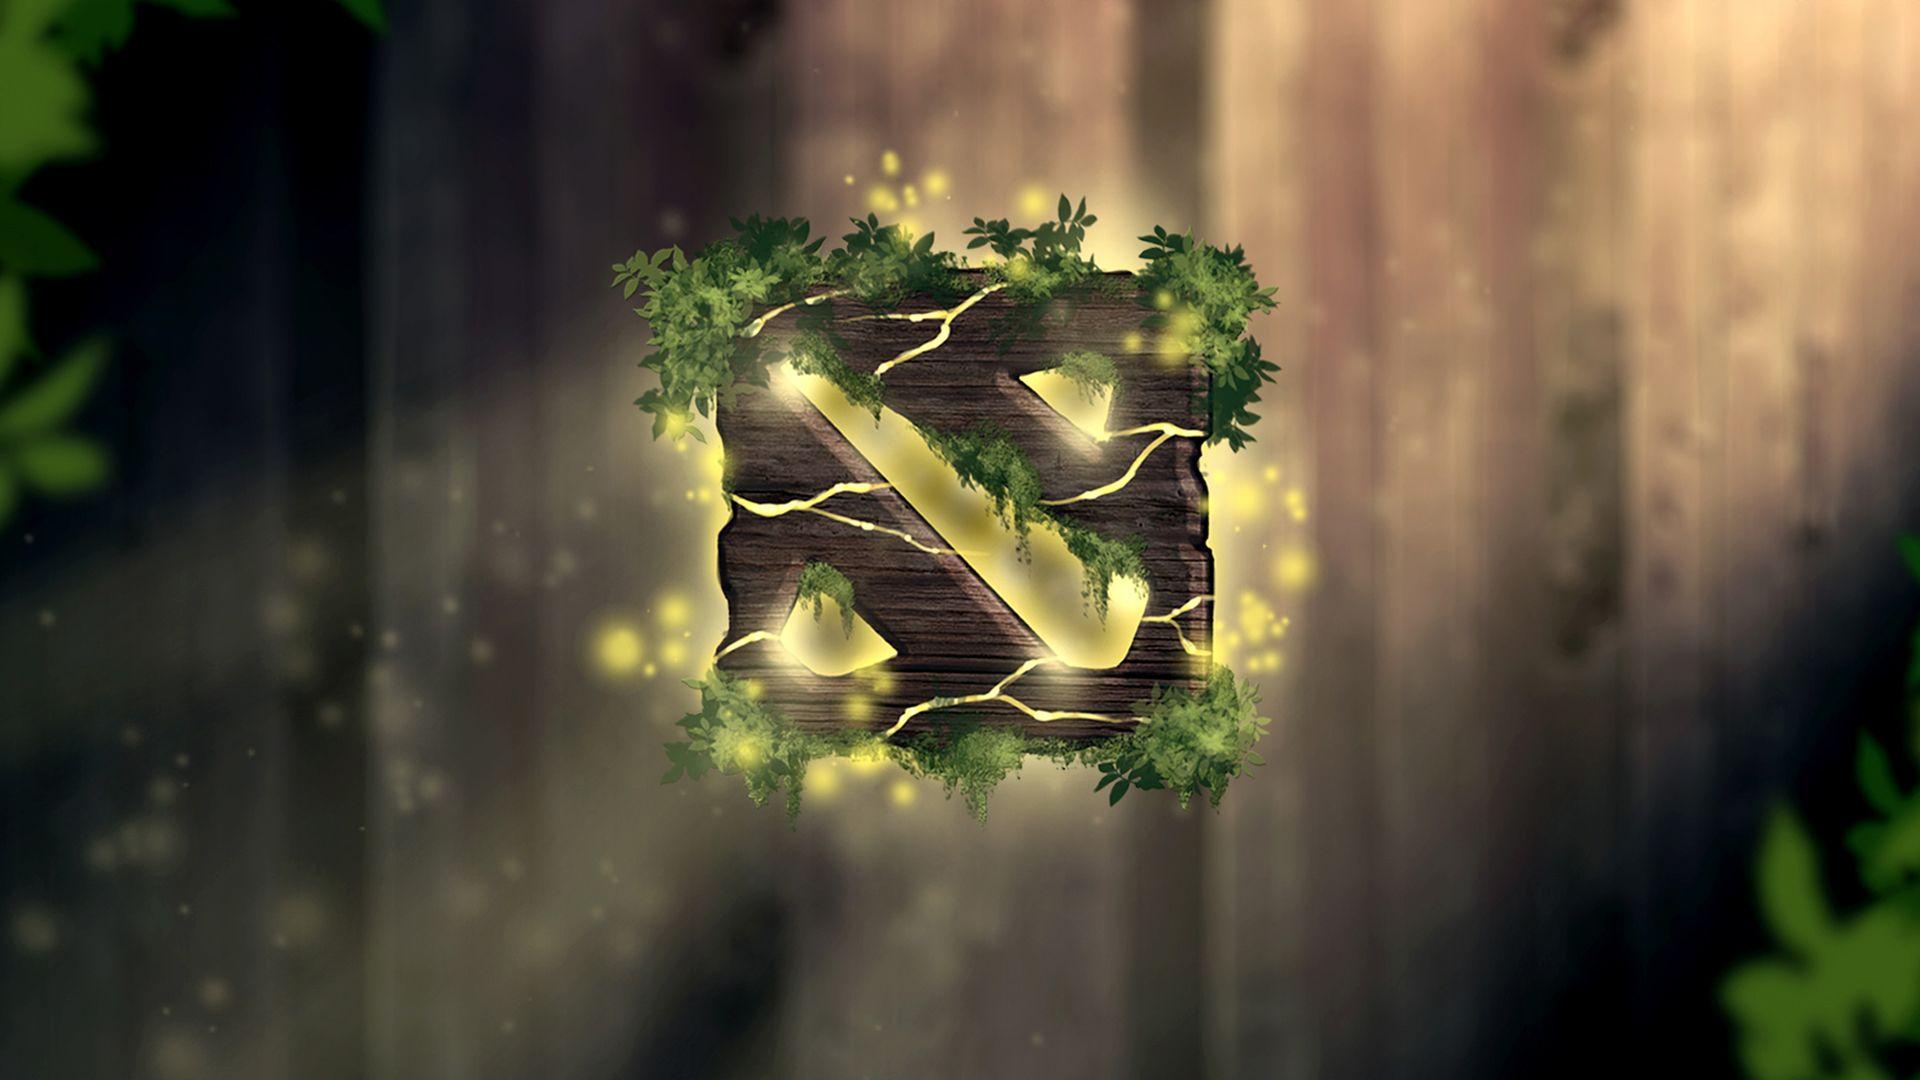 Logo Dota 2 Dota 2 Dota 2 Dota 2 Logo Dota 2 Game